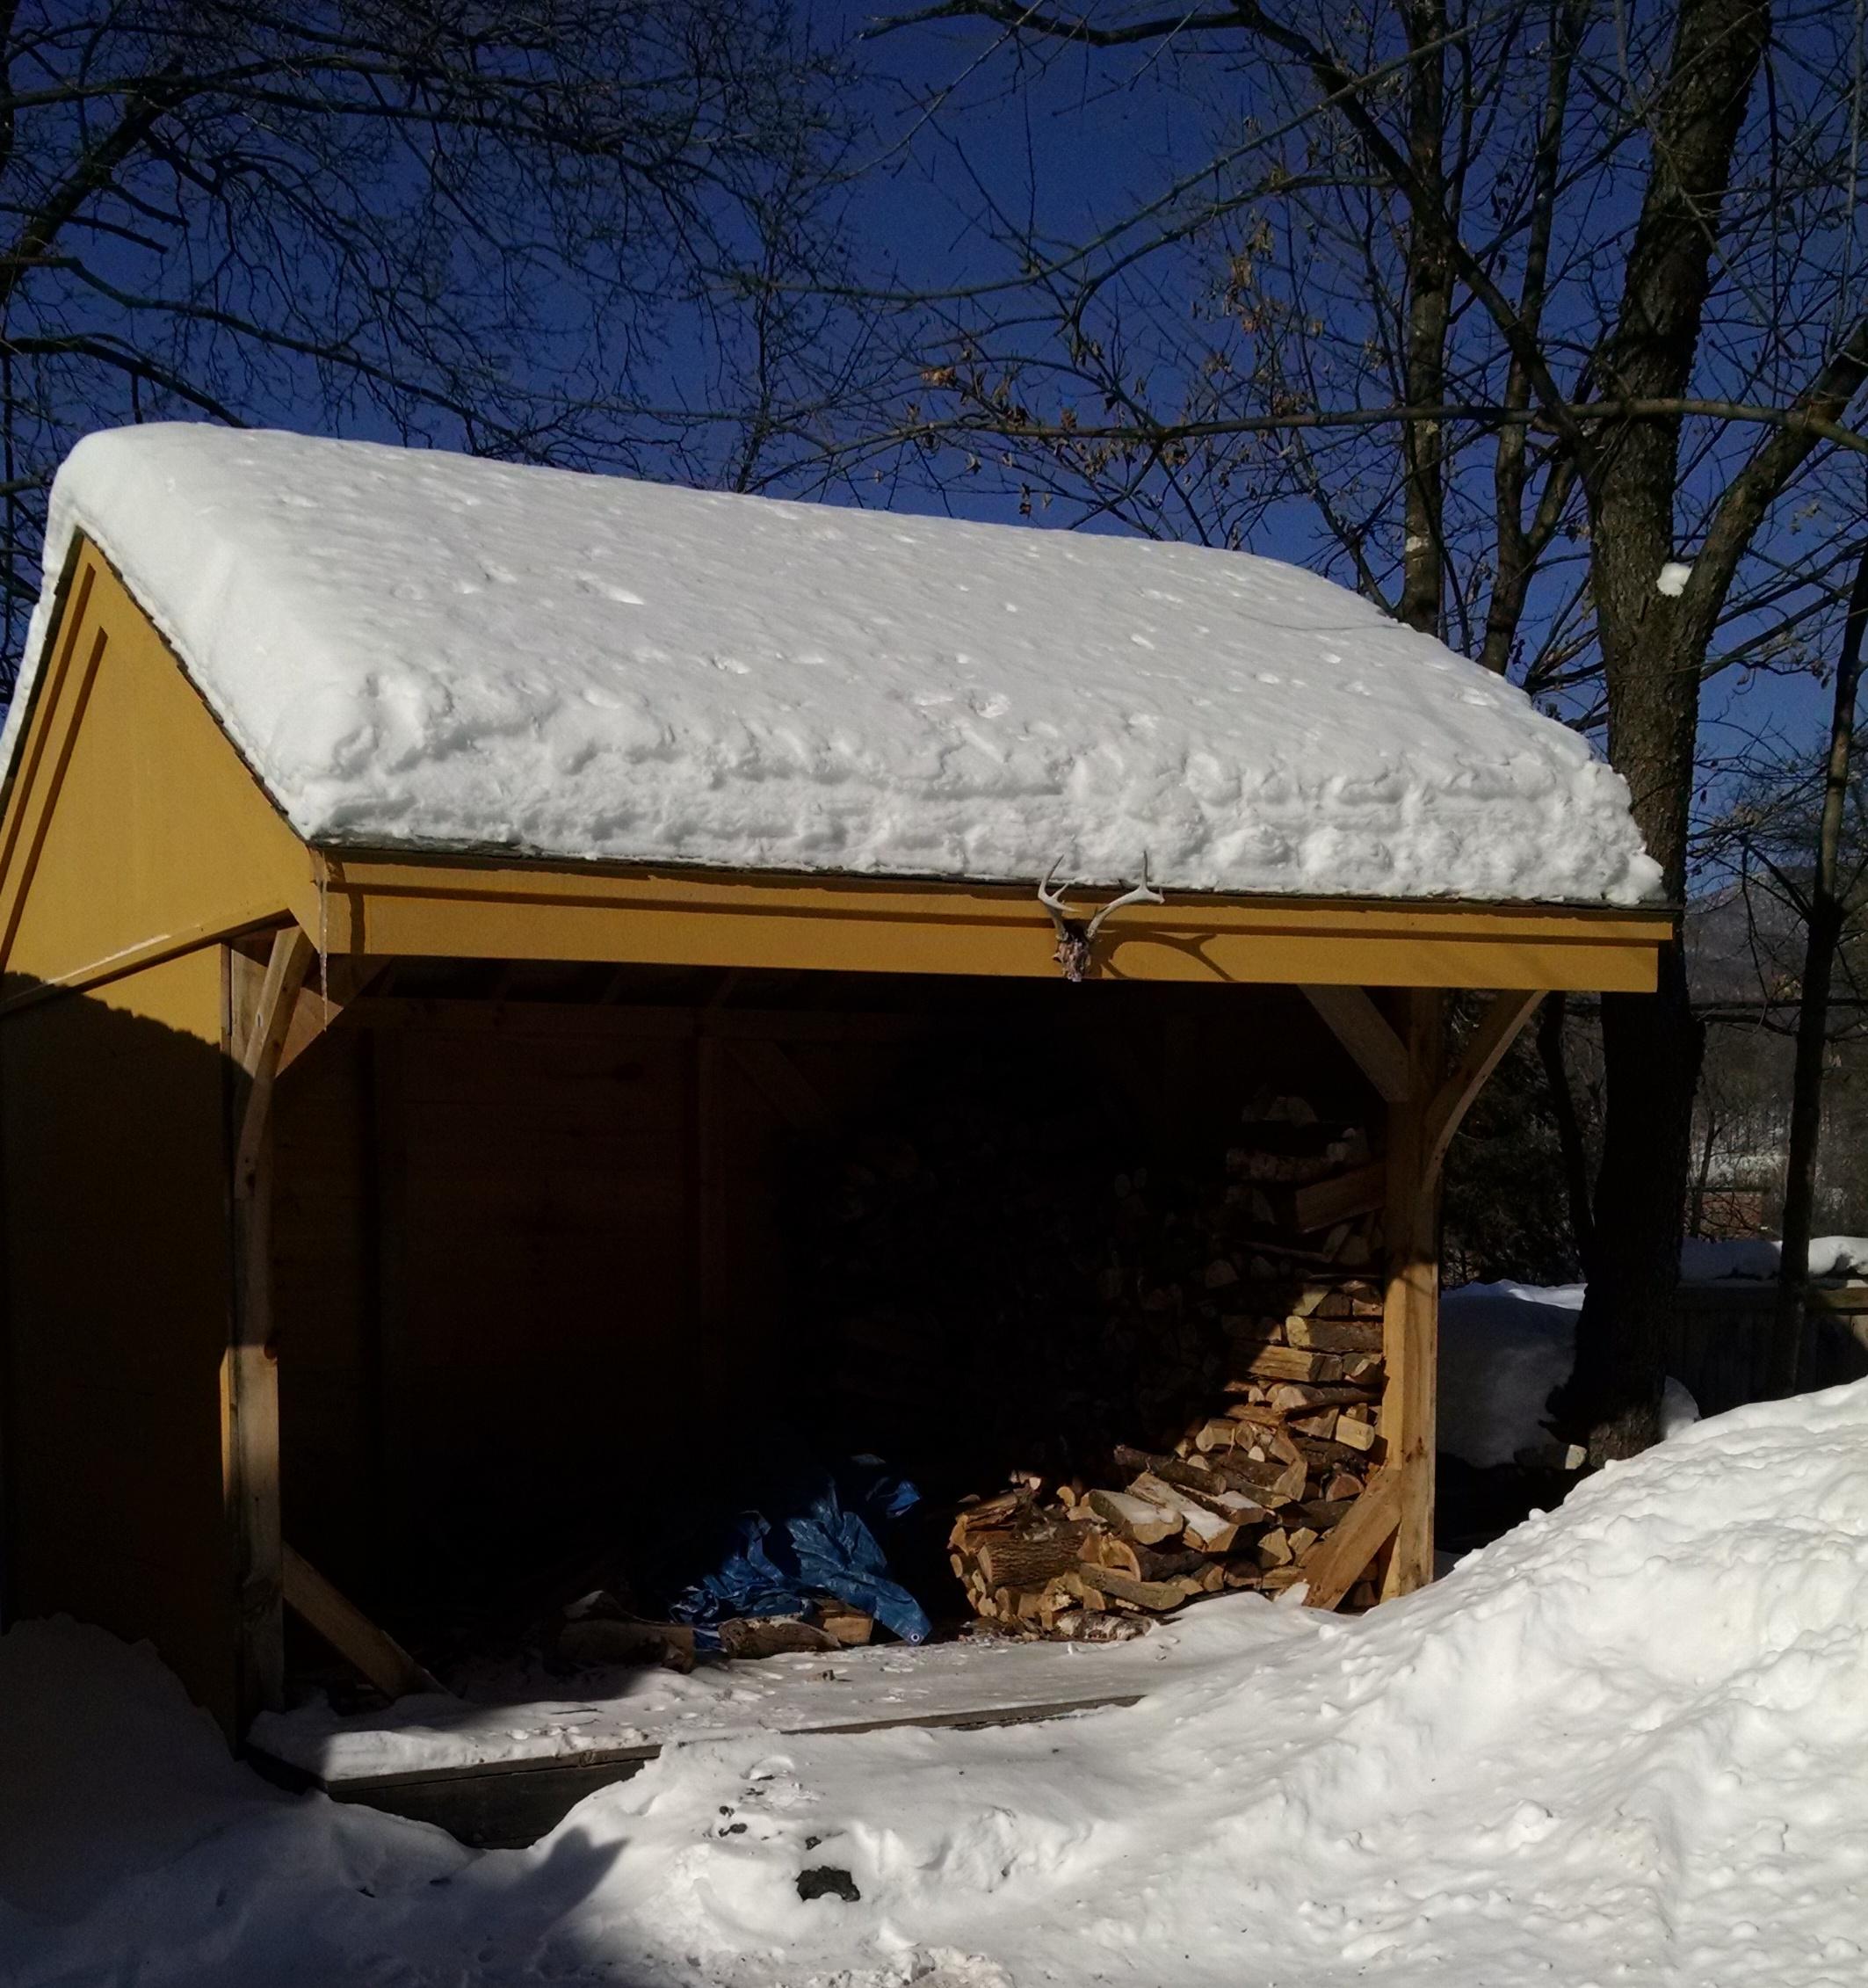 Wood Shed snow Feb 2015.jpg